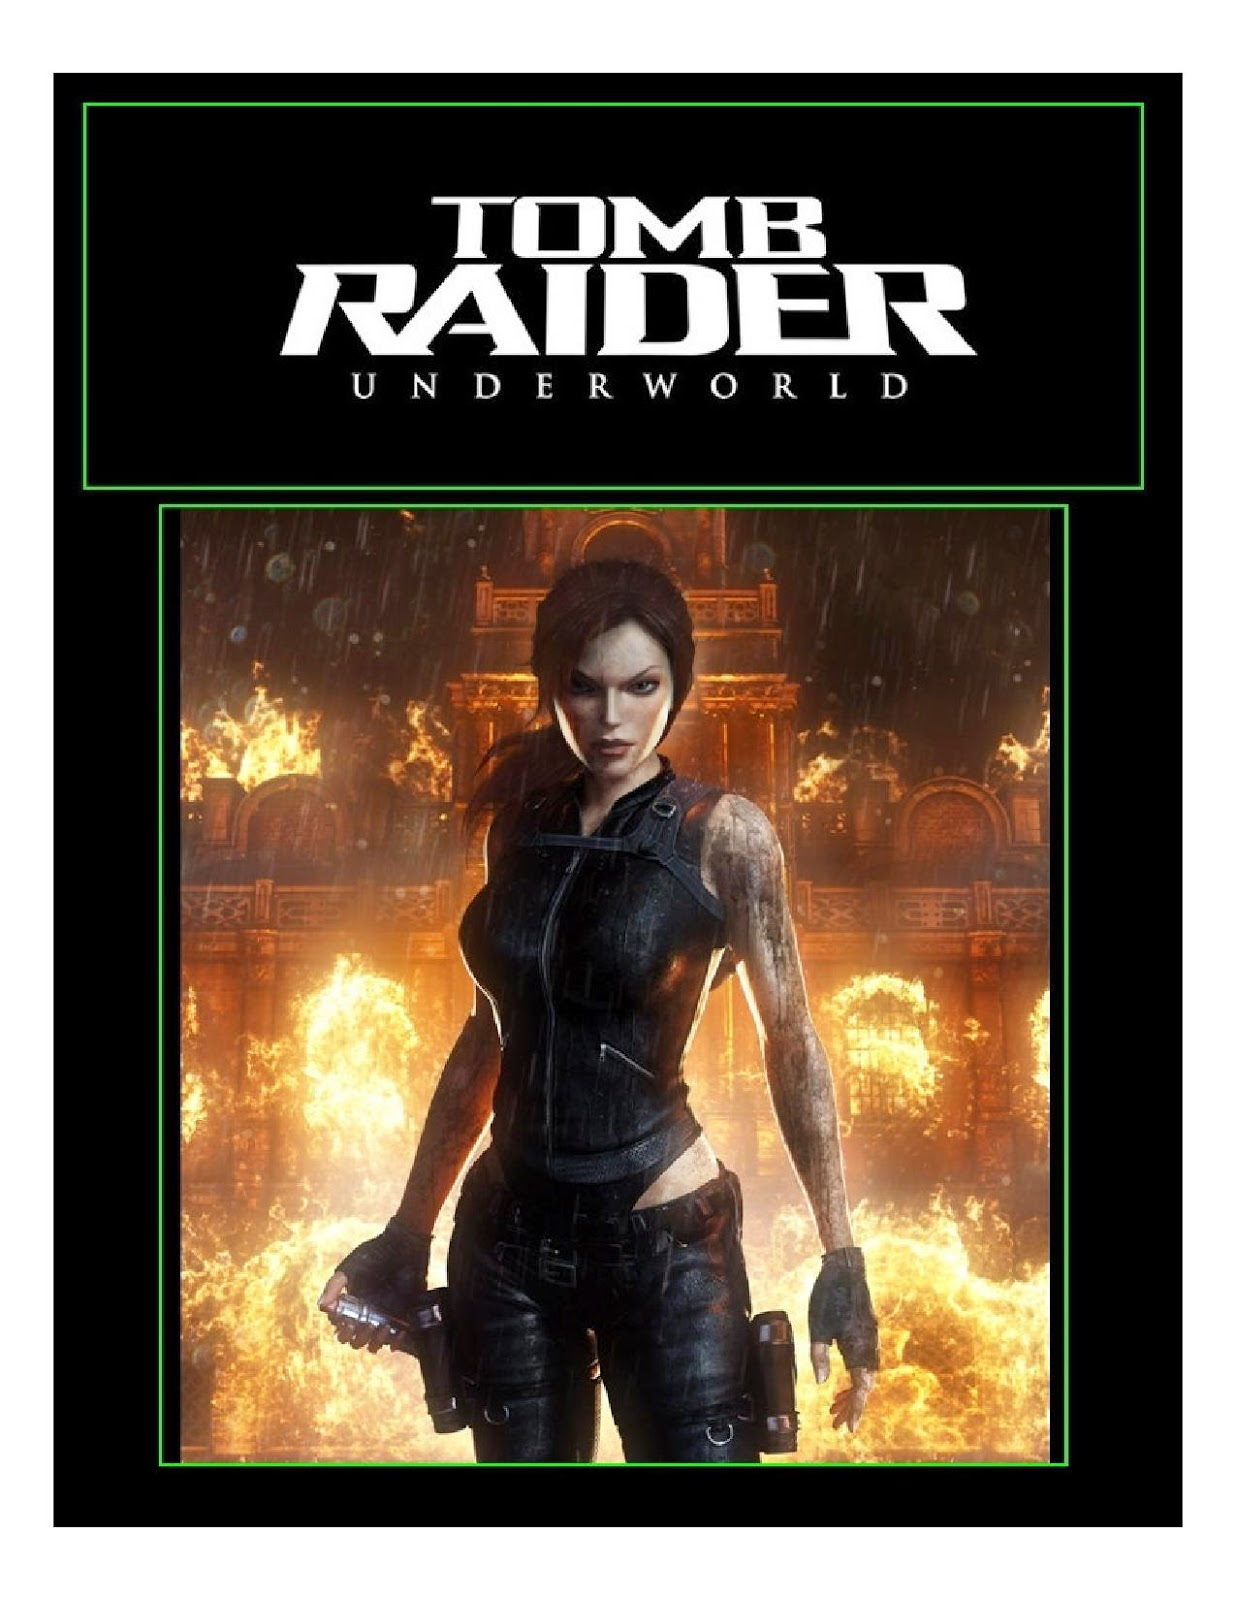 Tomb raider underworld toon hardcore porn pics porn film